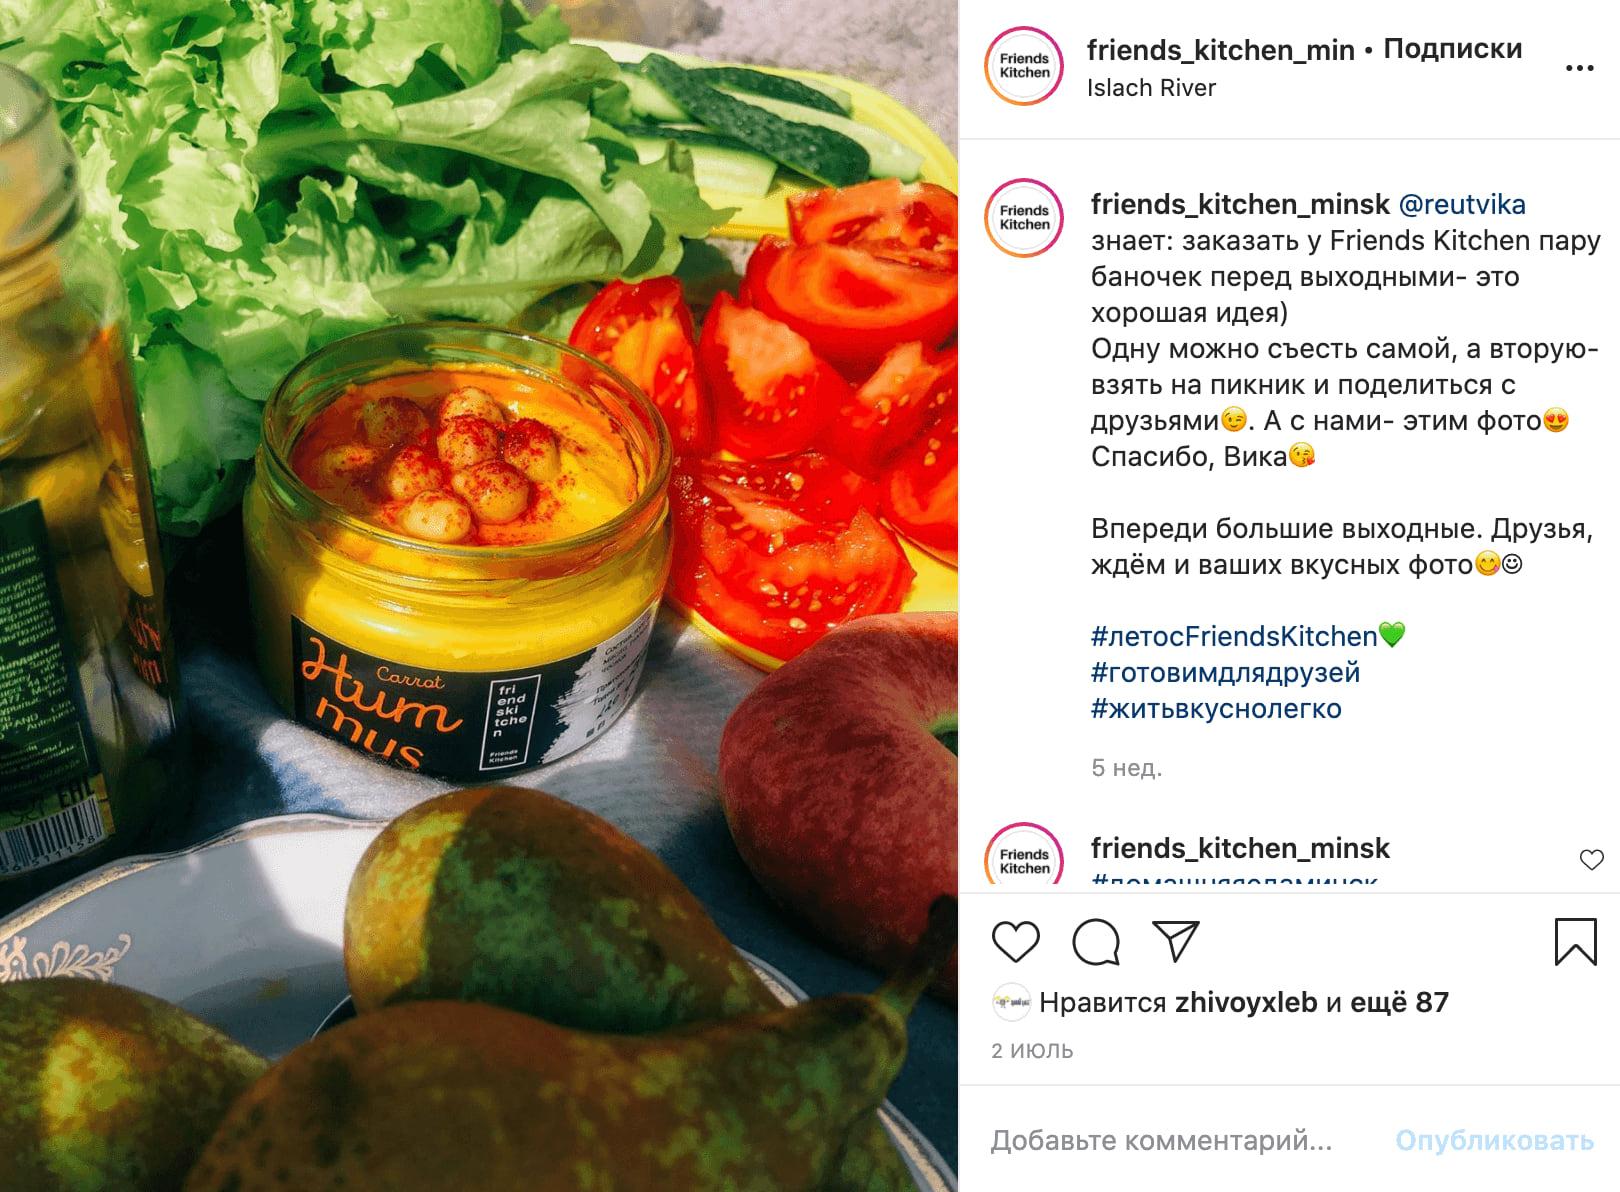 UGC-пост в Instagram бренда @friends_kitchen_minsk